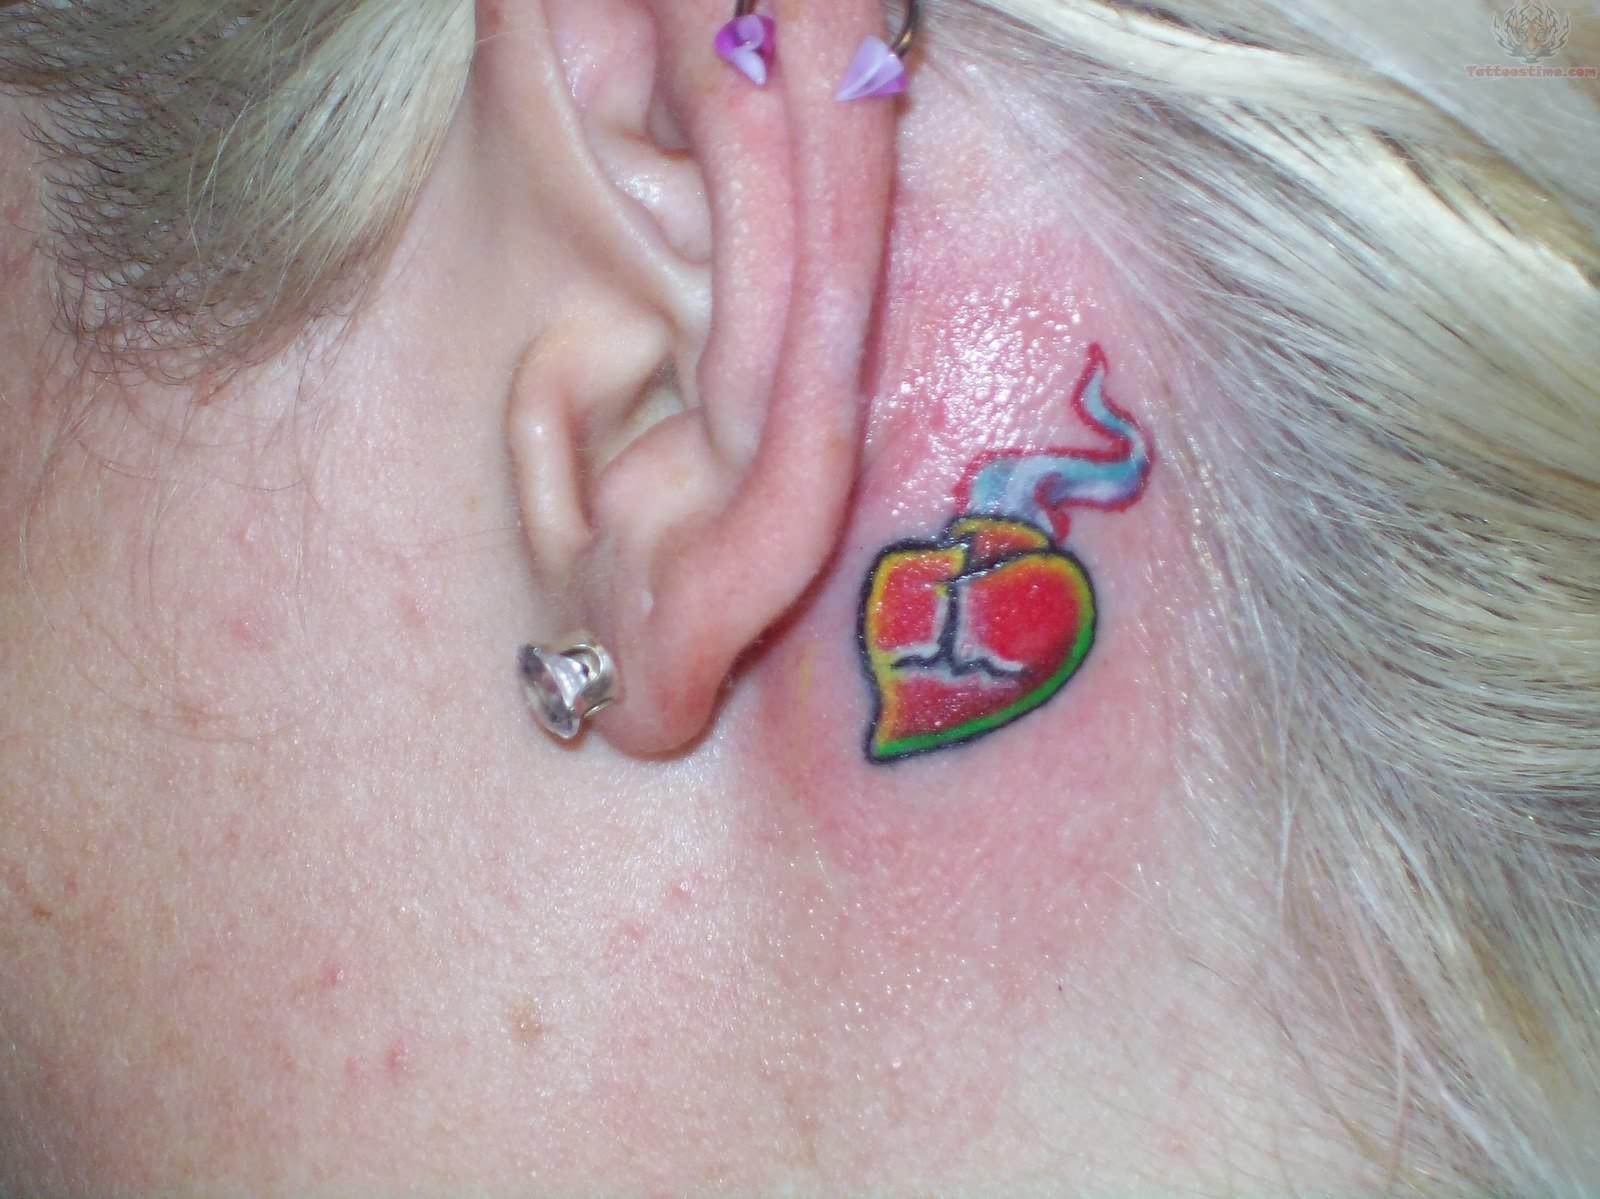 Sacred heart tattoo behind ear for Heart tattoo behind ear